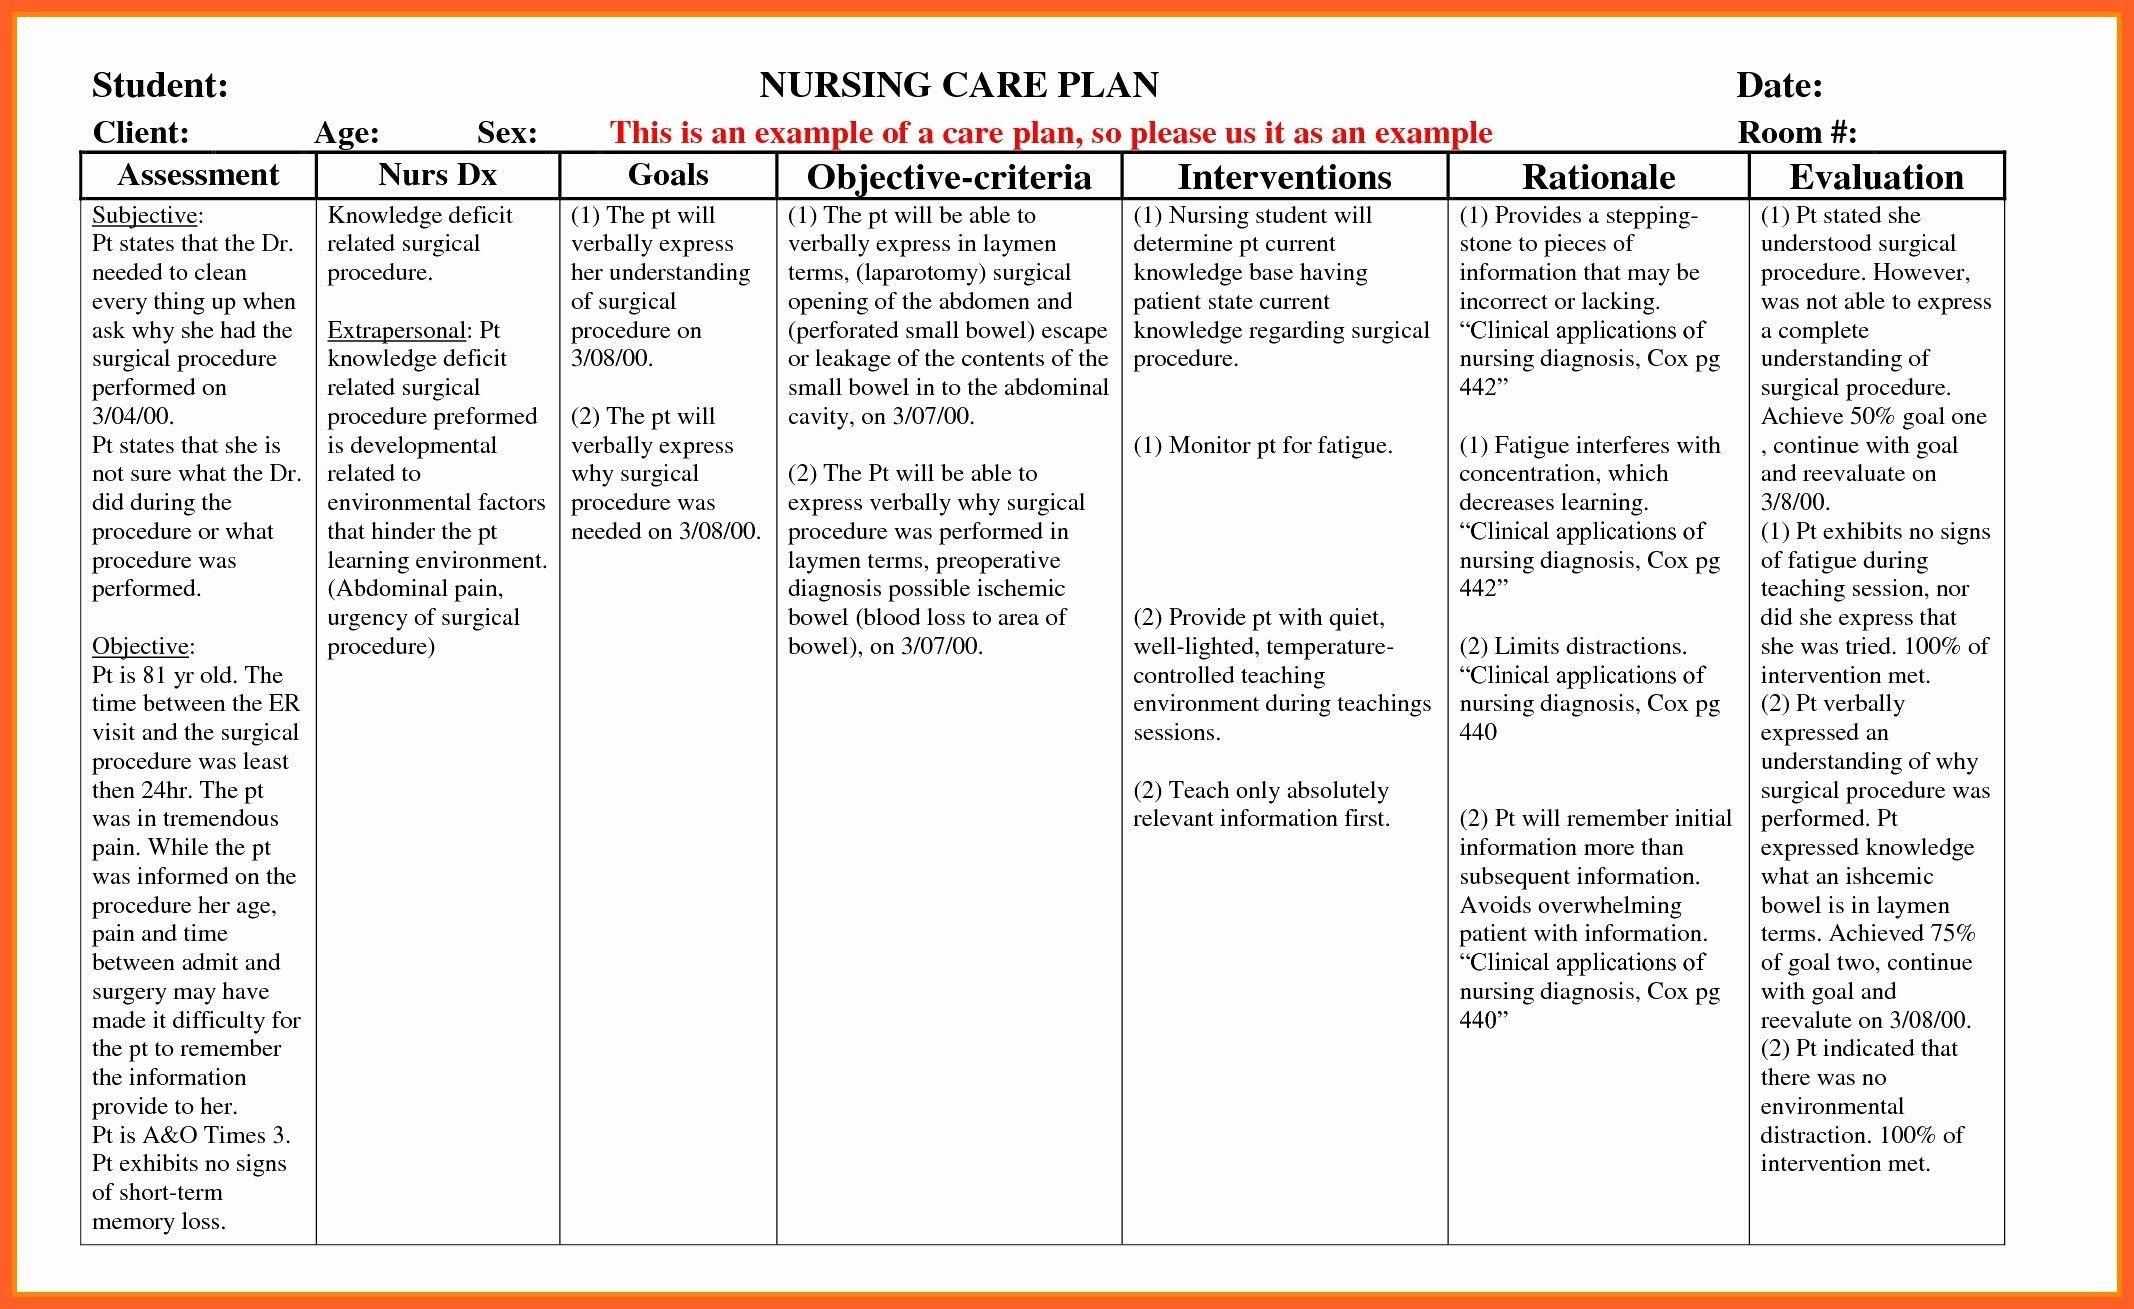 001 Fascinating Nursing Care Plan Template High Def  Example Australia Home For DiabeteFull